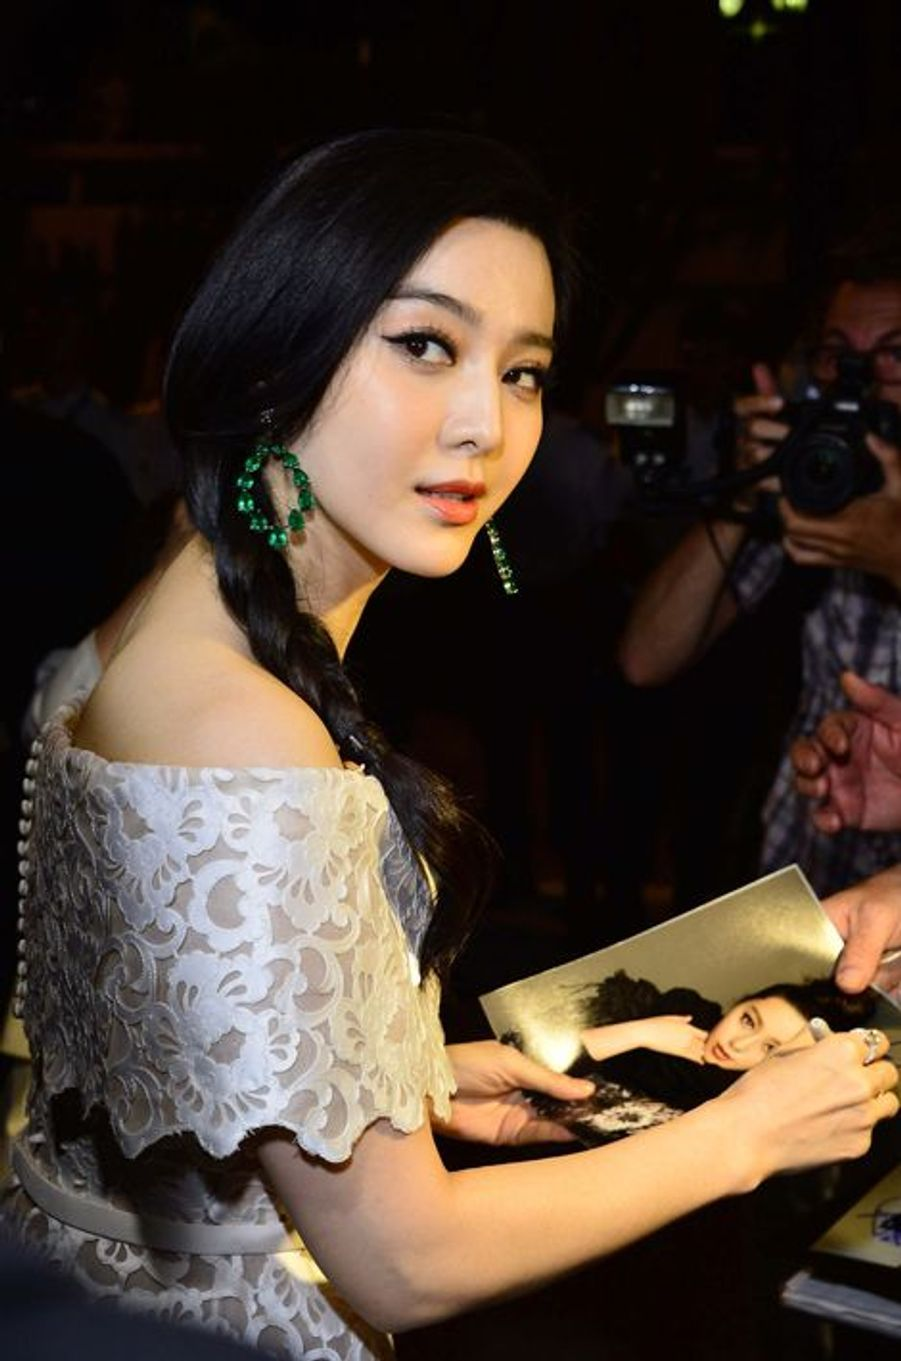 L'actrice et chanteuse chinoise Li Bingbing